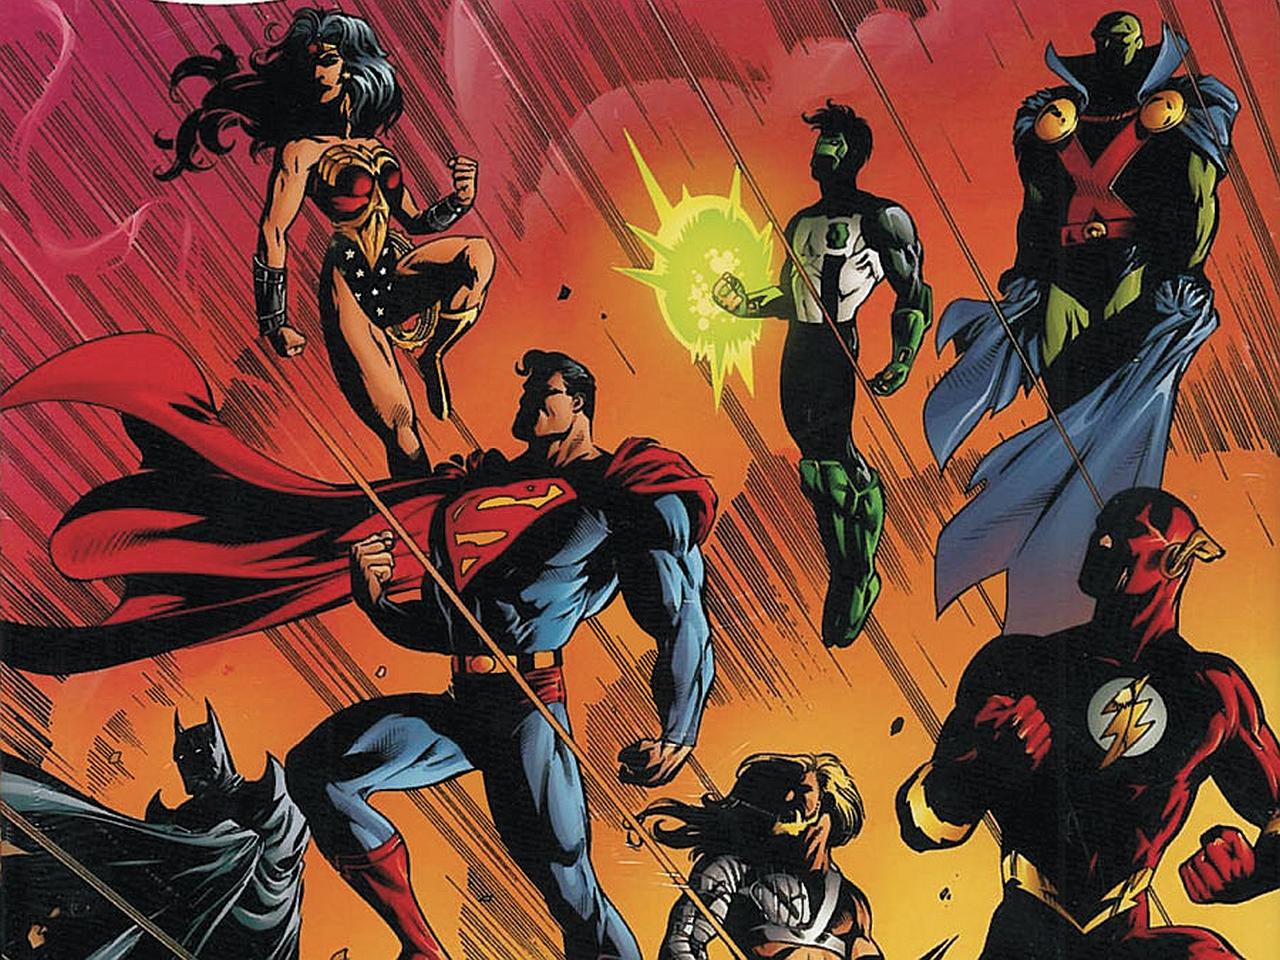 Justice league desktop wallpaper wallpapersafari - League desktop backgrounds ...